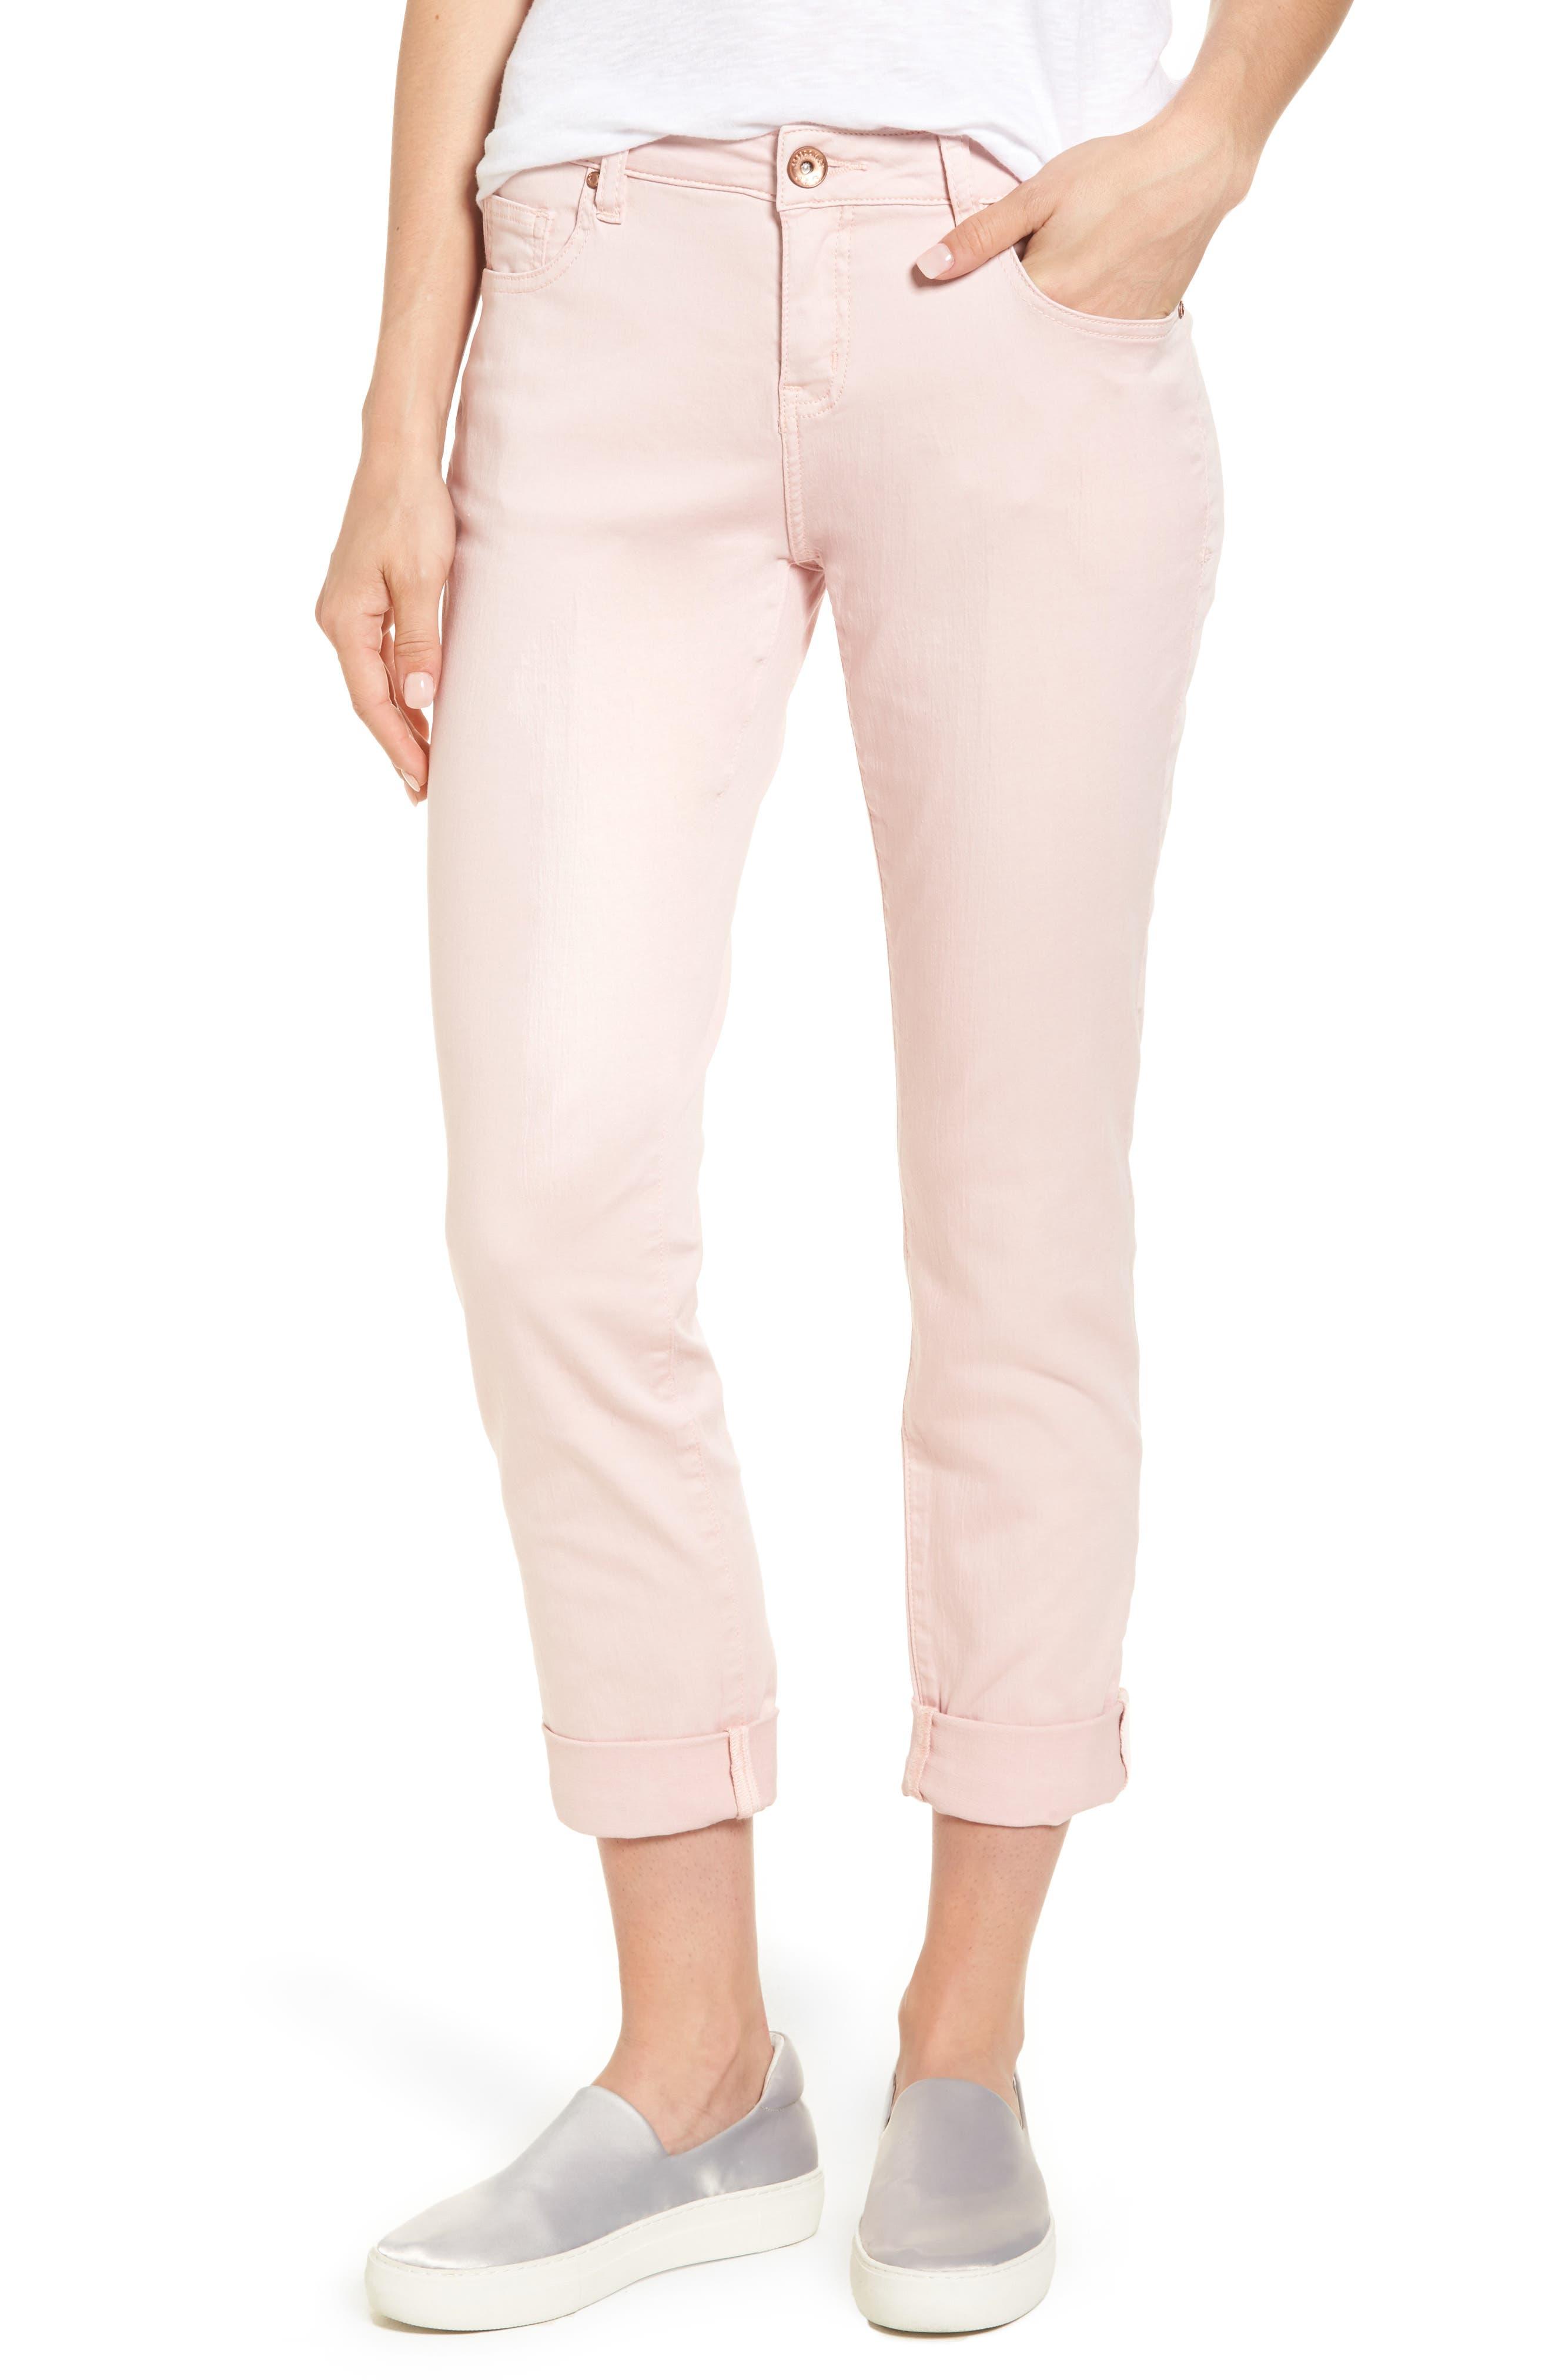 Jag Jeans Carter Knit Denim Girlfriend Jeans (Conch Shell)